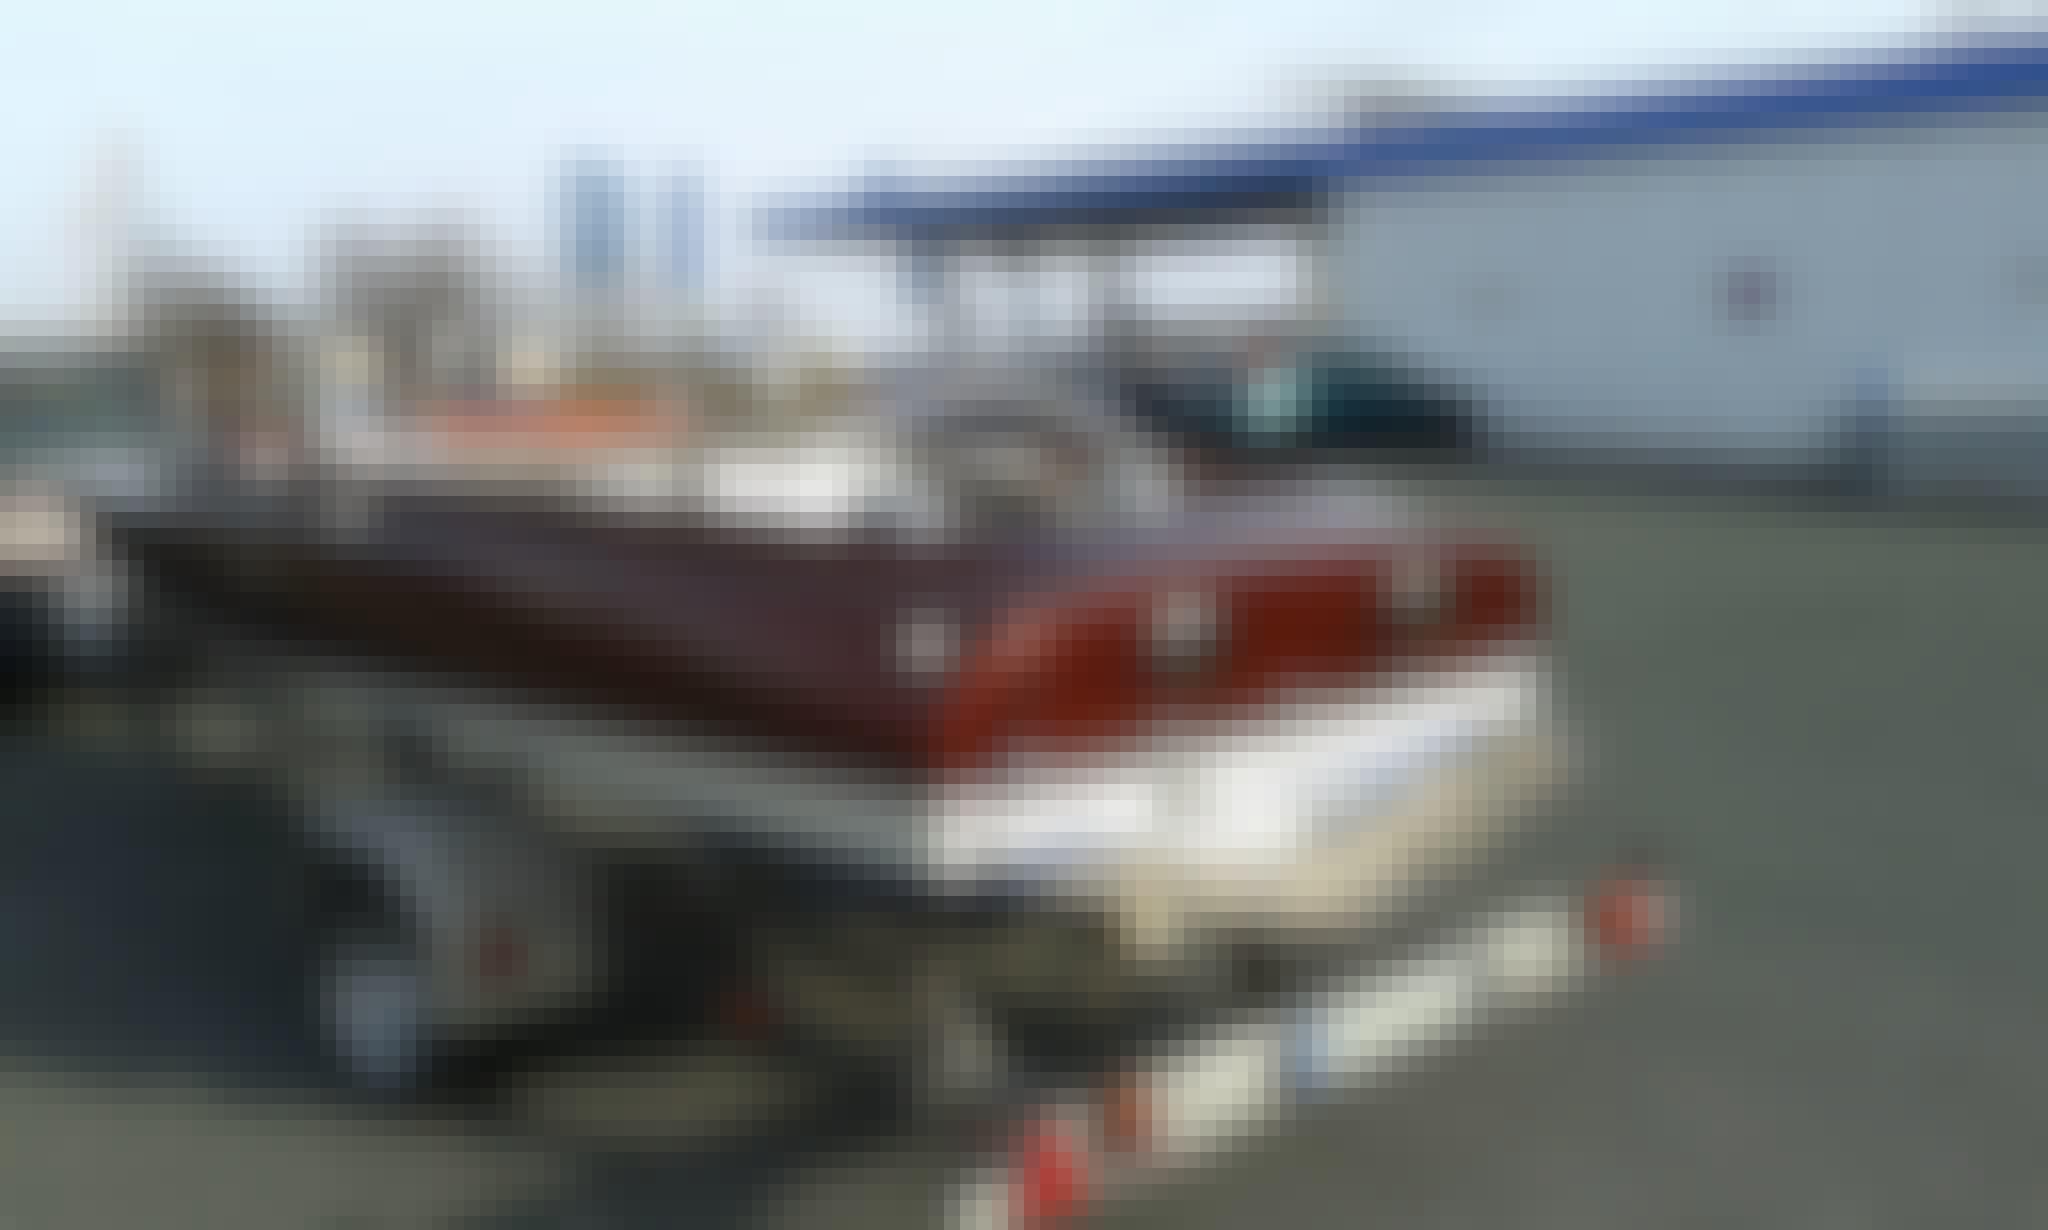 Classic Speedboat Aquacraft California Boat Rental in Wiesbaden, Germany